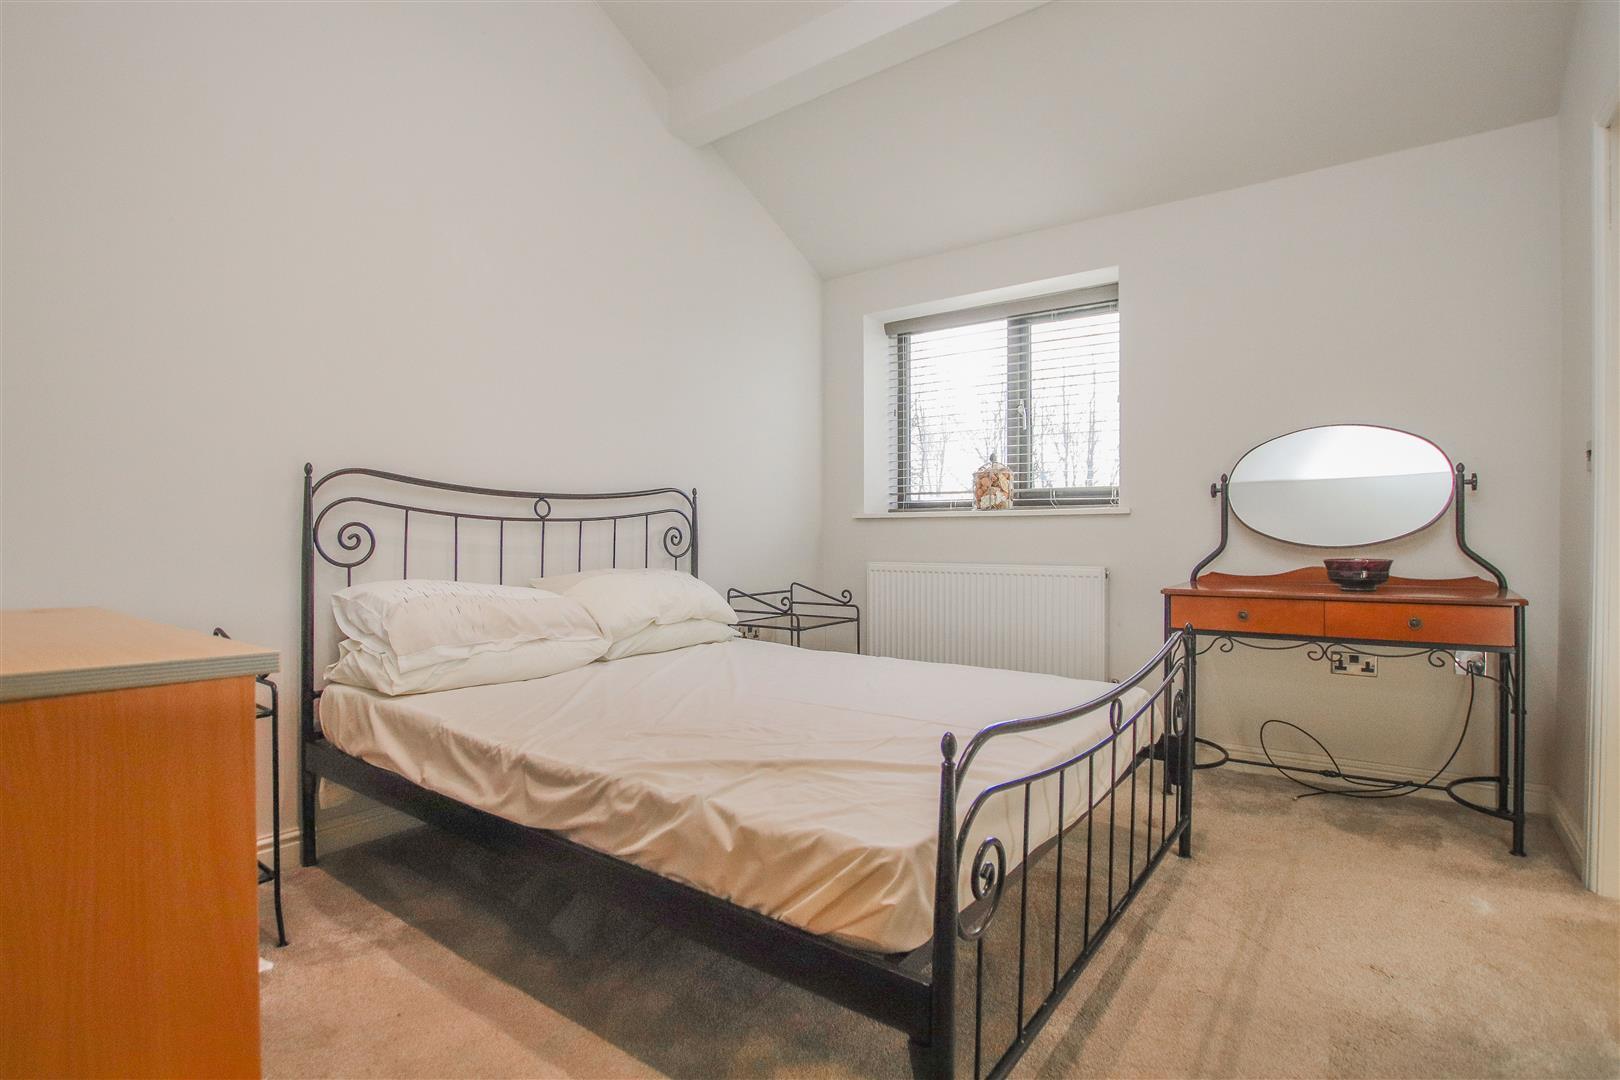 6 Bedroom Barn Conversion For Sale - 50.JPG